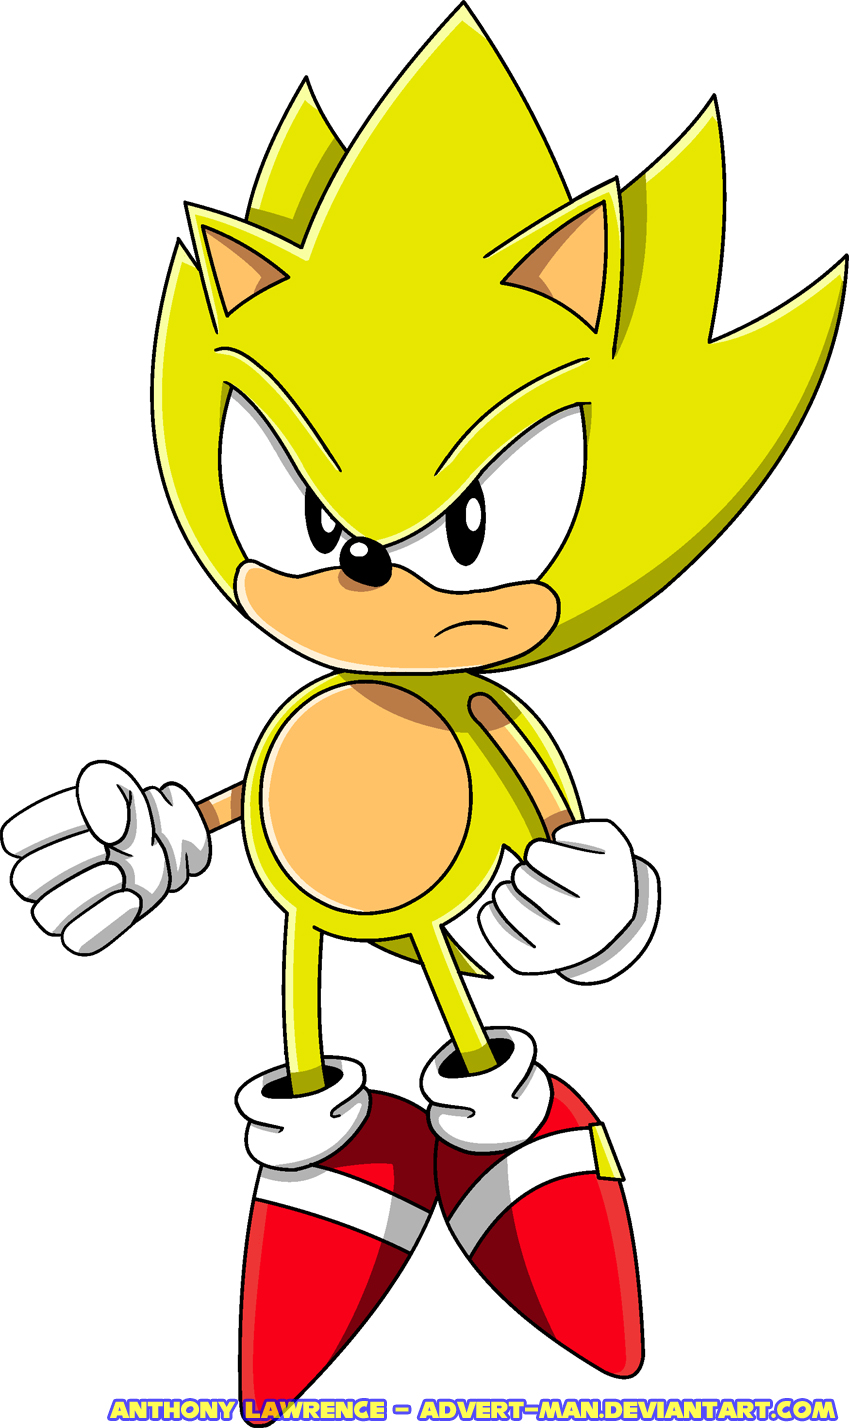 Classic Super Sonic by Advert-man on DeviantArt